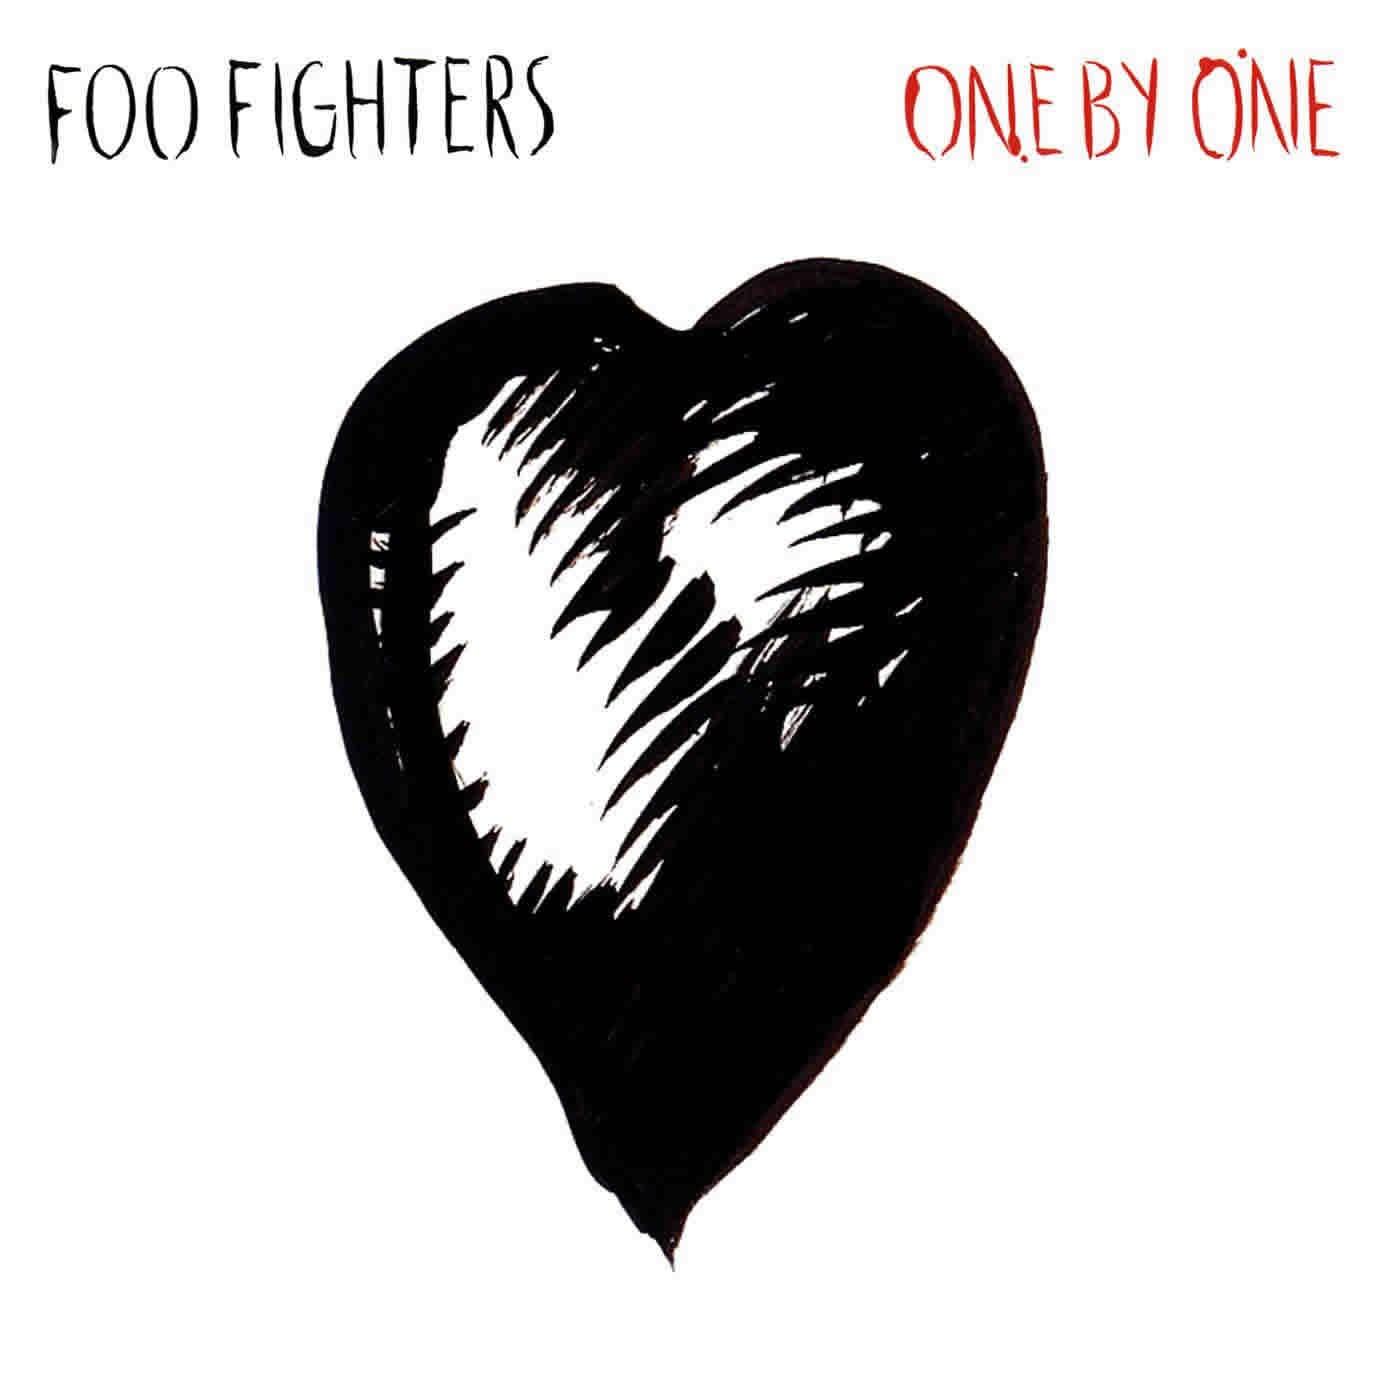 Foo Fighters Cds : virgil 39 s blog foo fighters concert countdown x one by one ~ Hamham.info Haus und Dekorationen